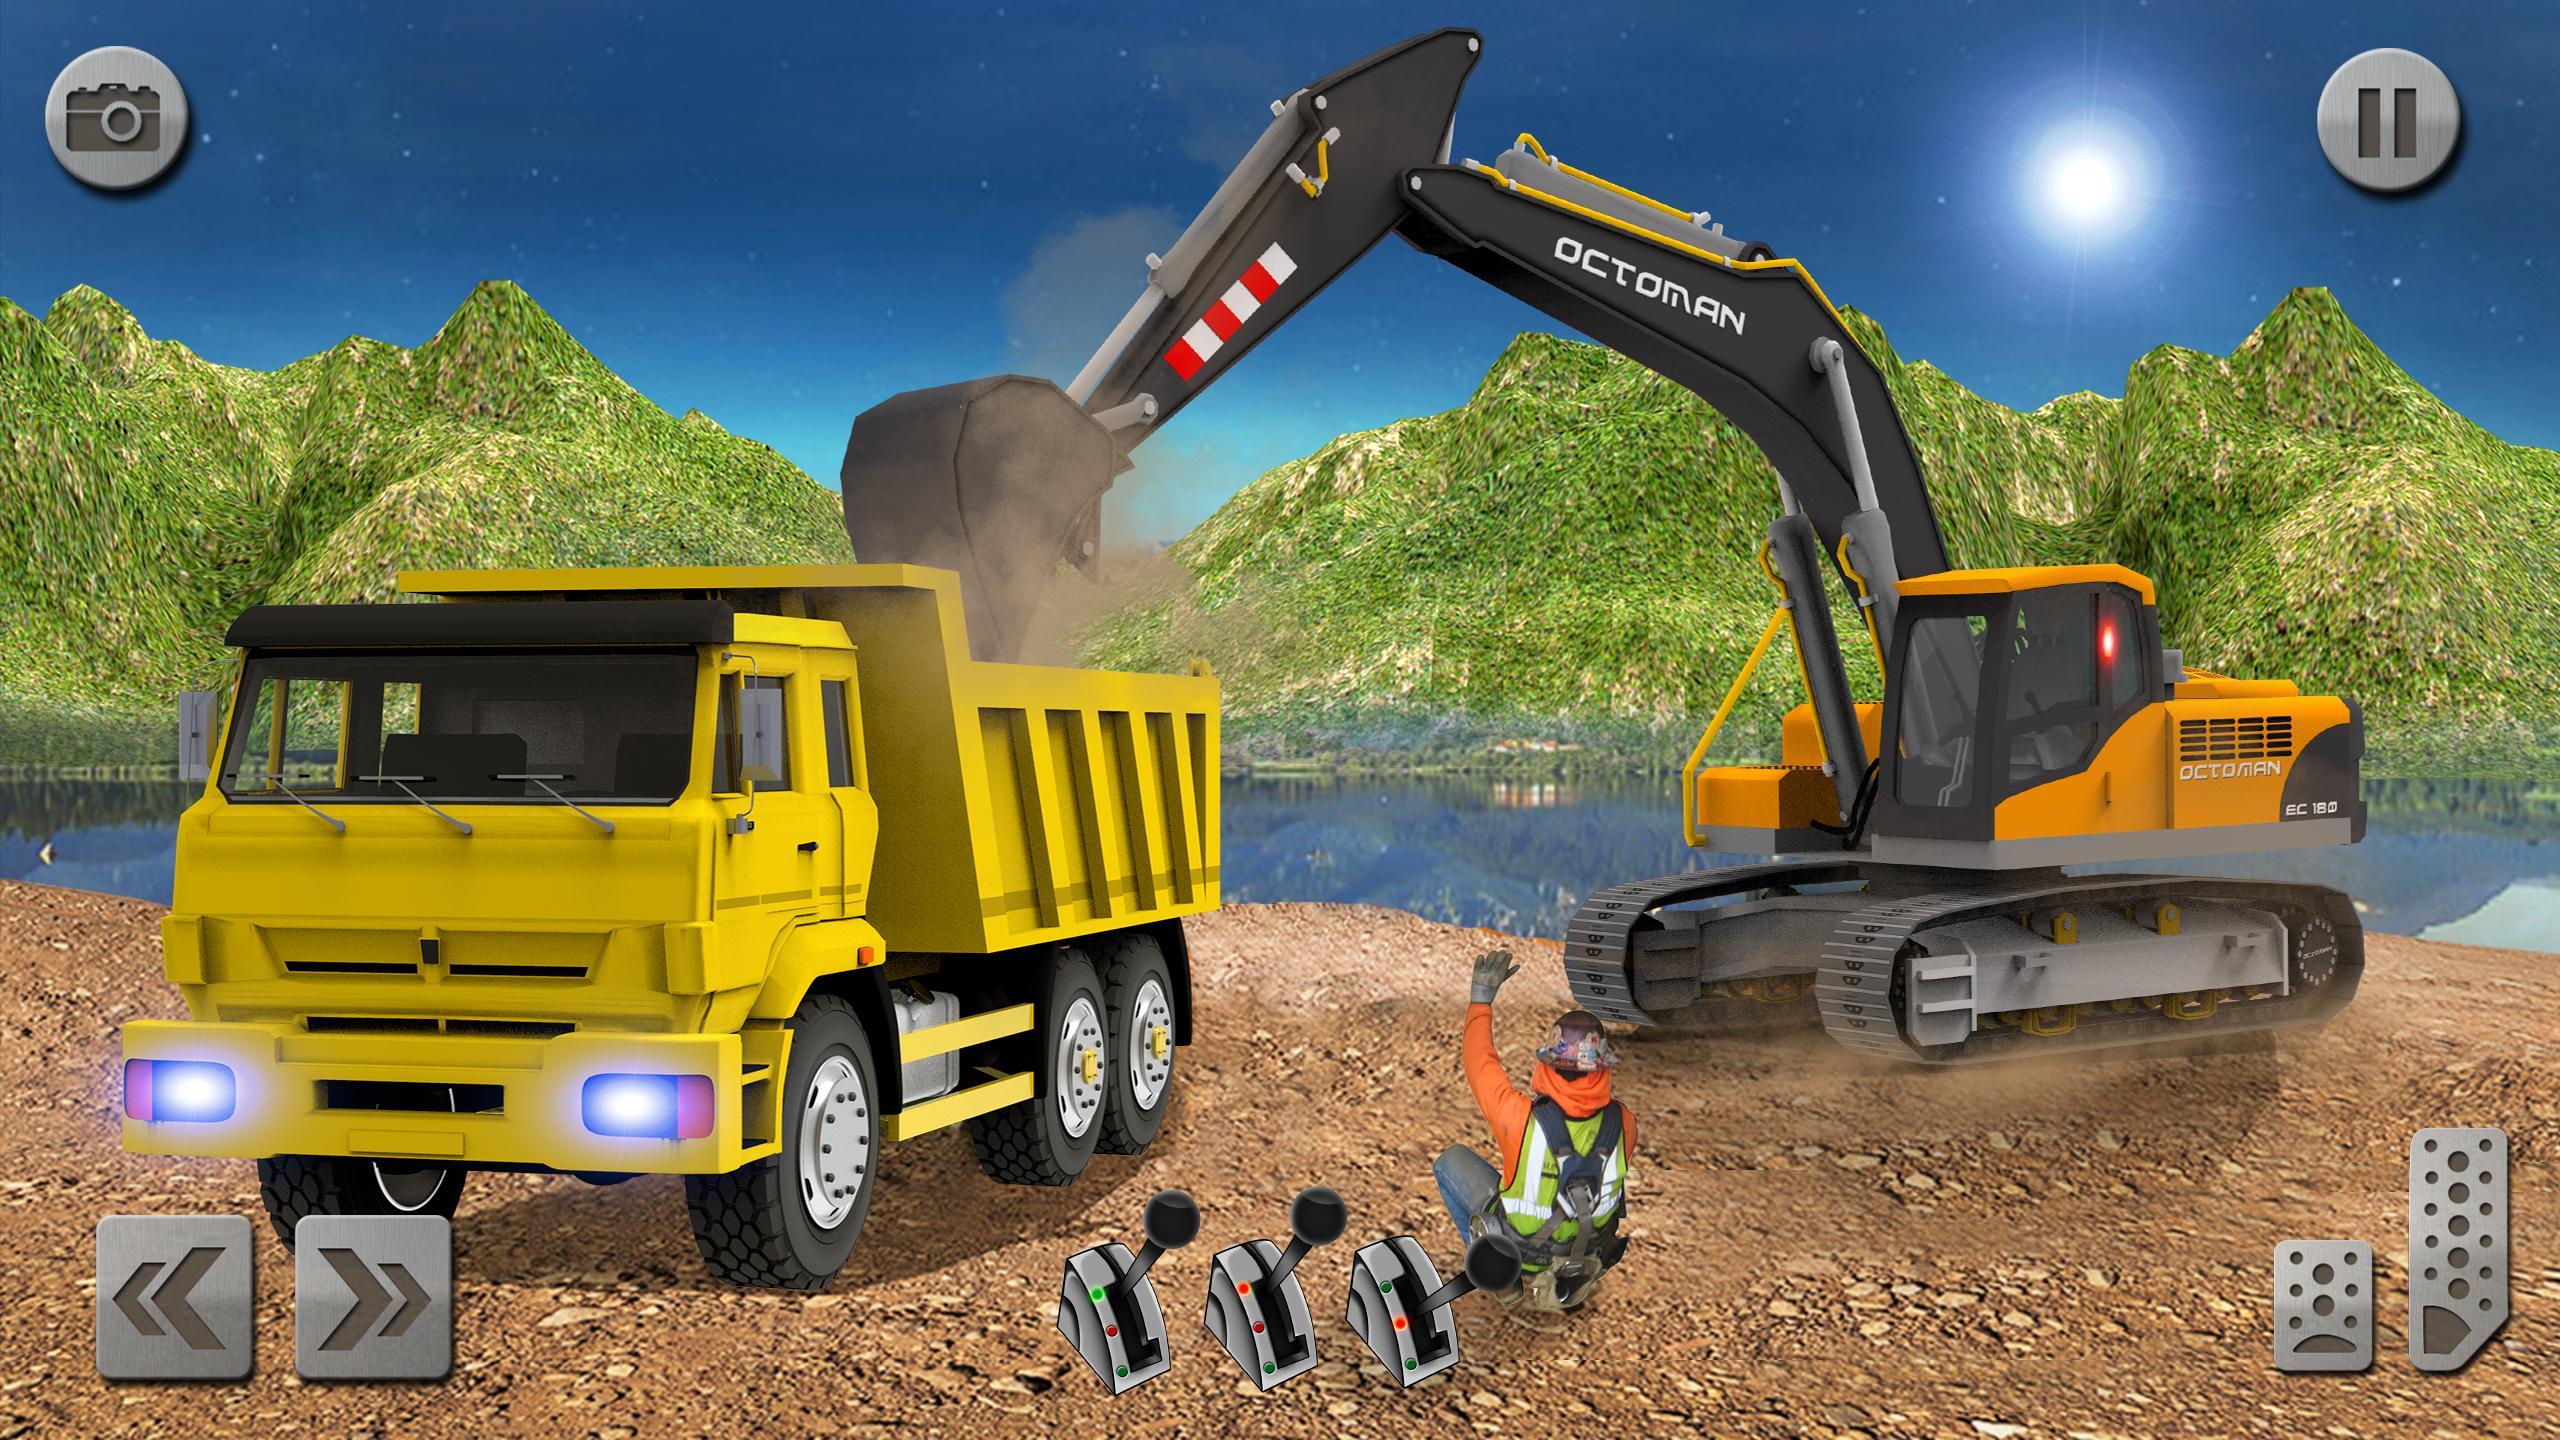 Sand Excavator Truck Driving Rescue Simulator game 5.2 Screenshot 15